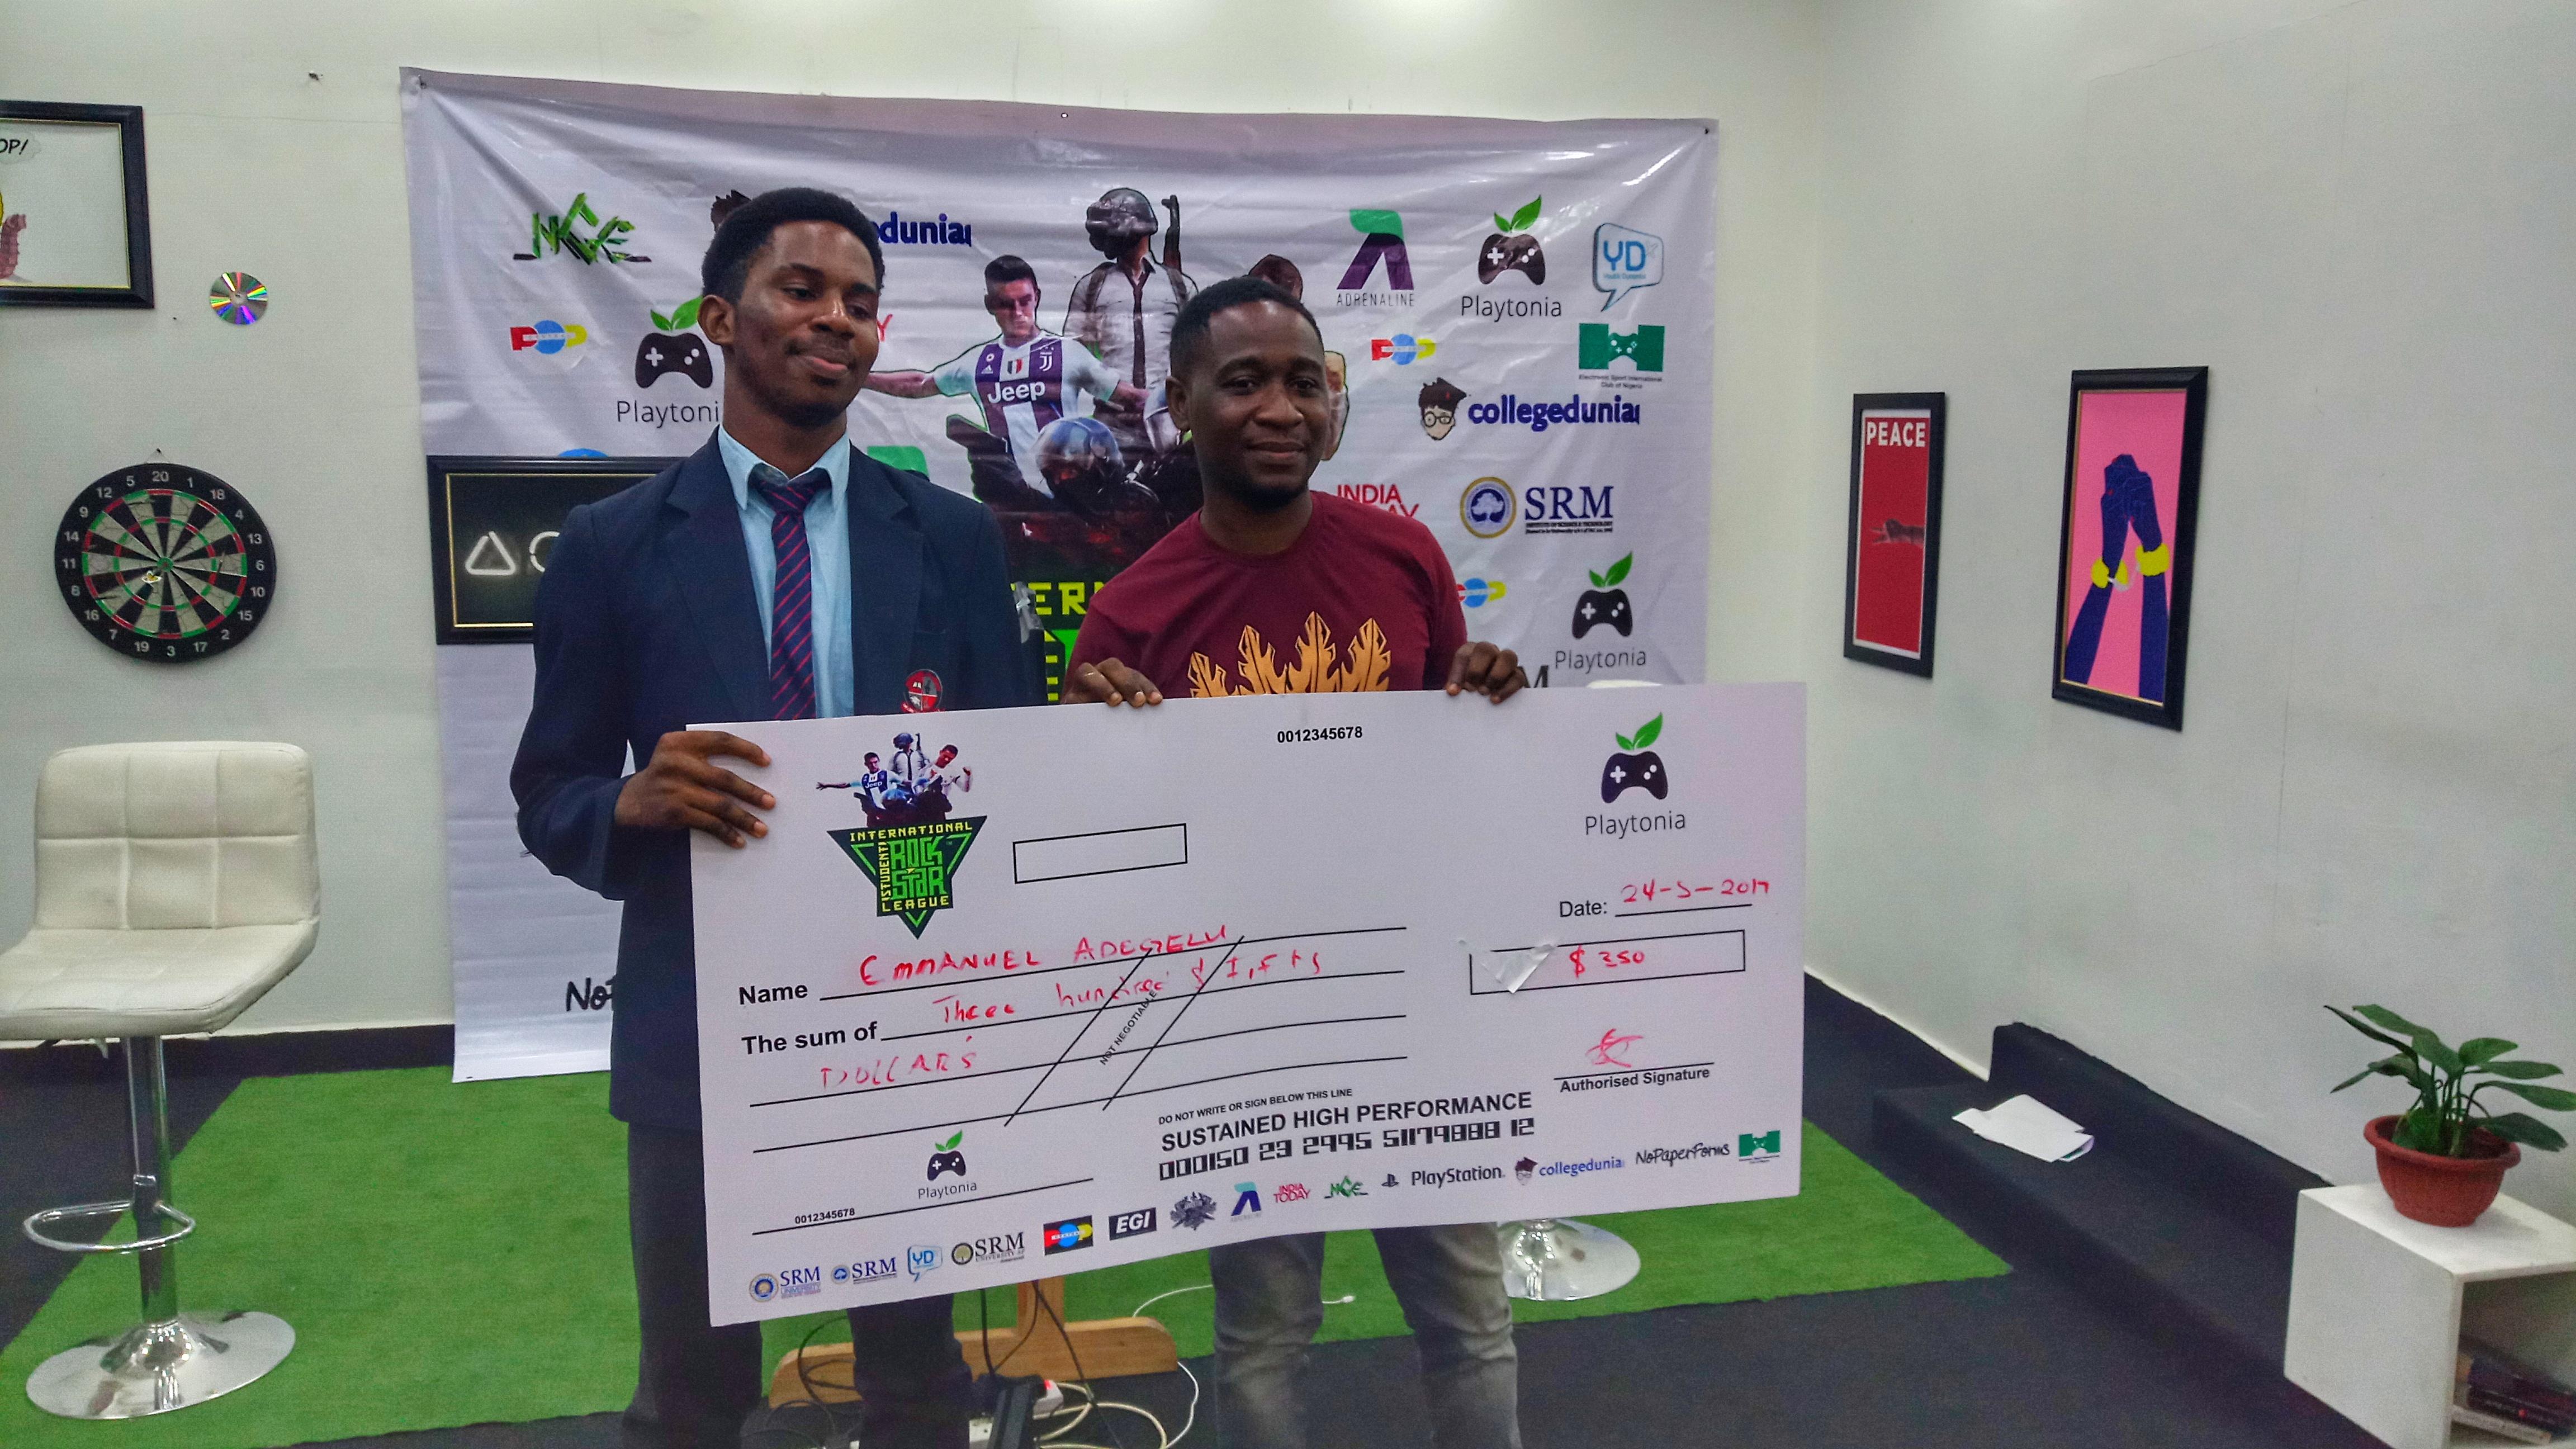 IMG 20190524 173137 5 01 - International Student Rockstar League Holds Nigerian Qualifiers.